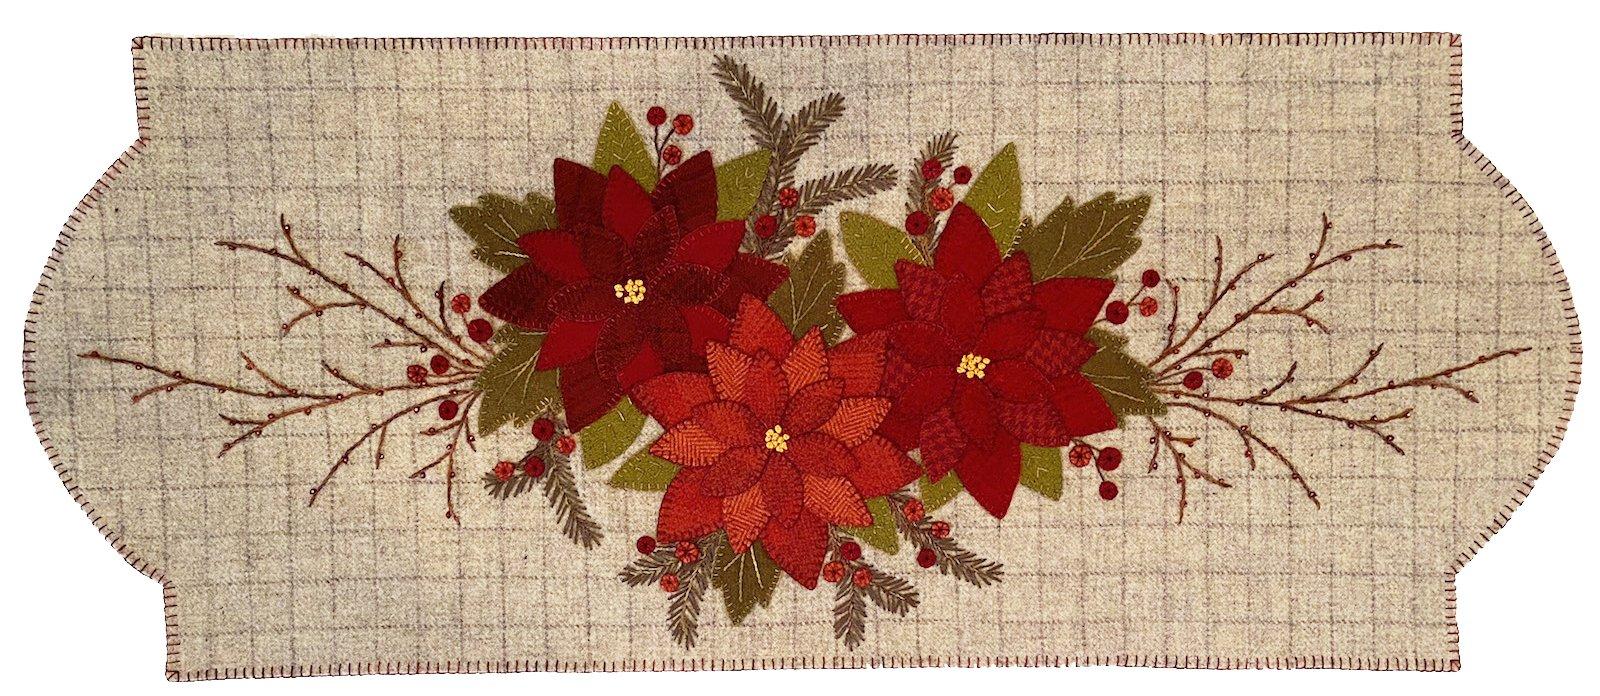 Star of Bethlehem by Karen Yaffe Wool Runner Pattern - DIGITAL DOWNLOAD